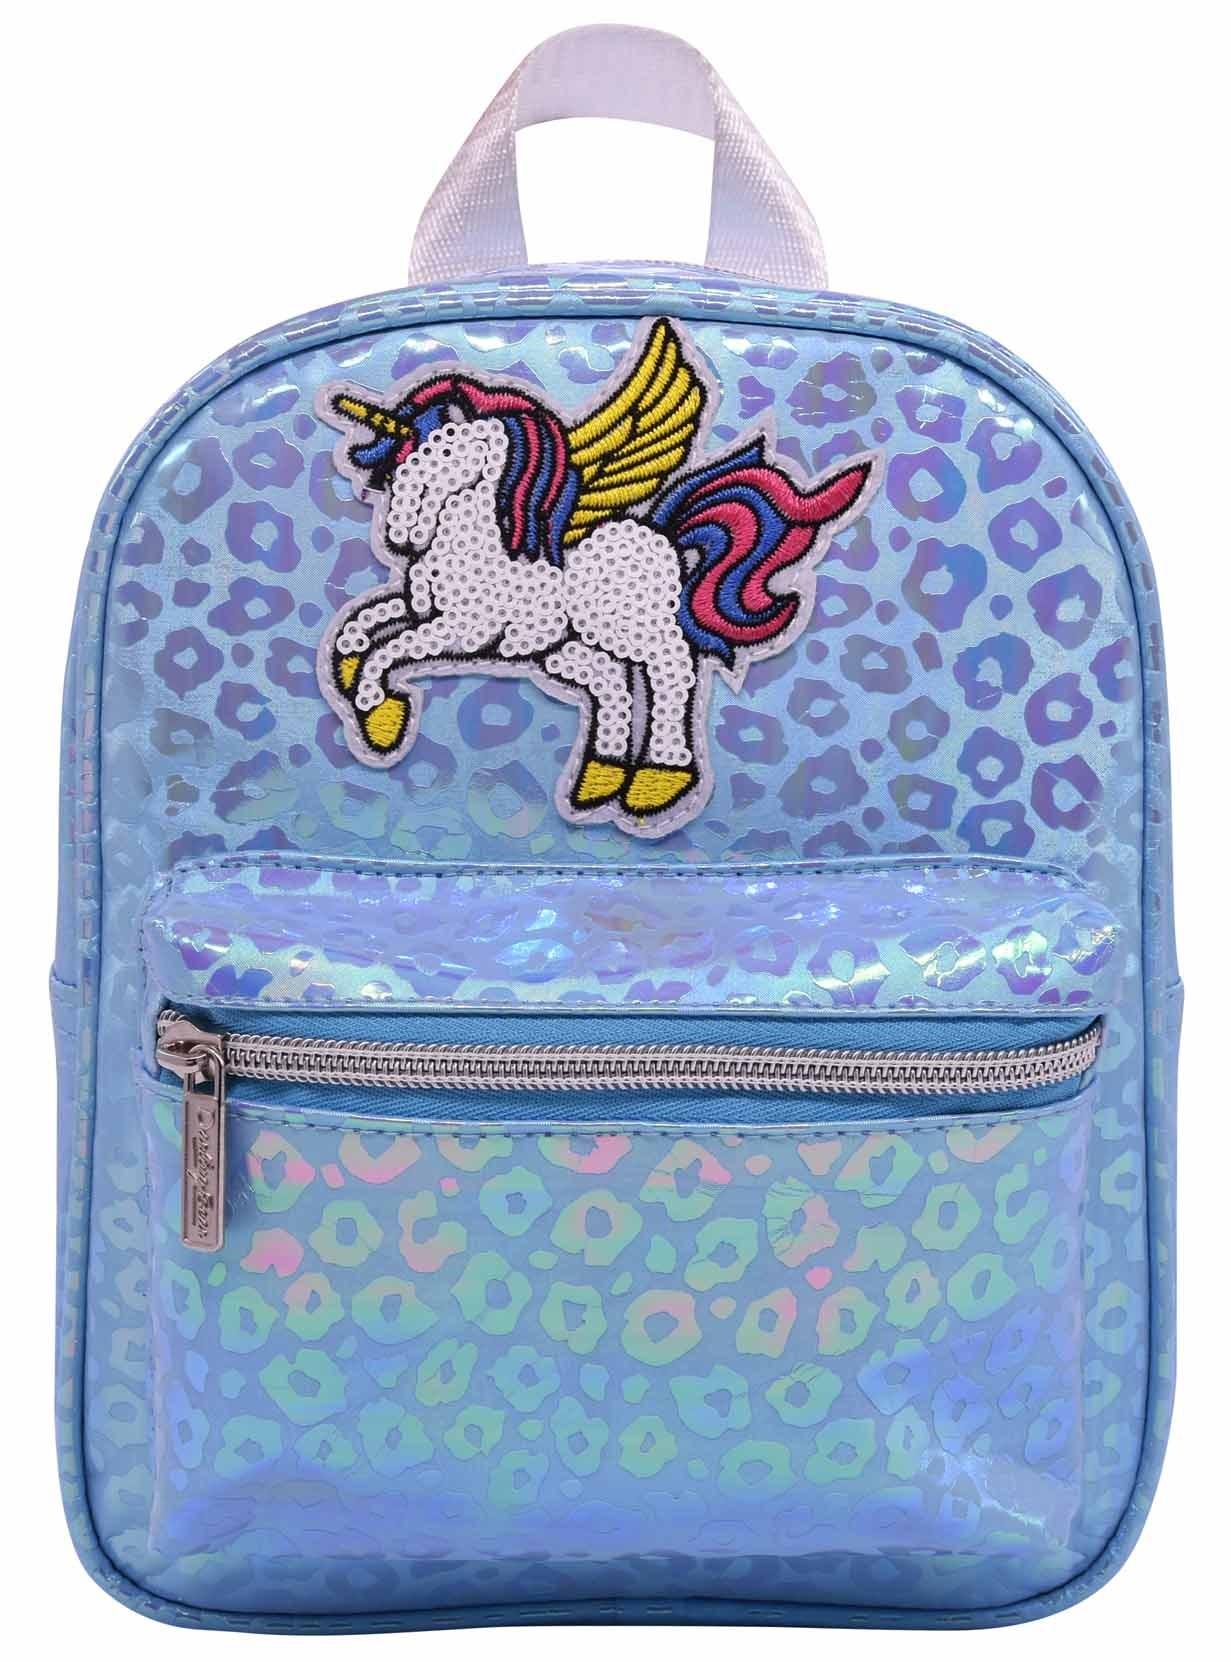 PVC cartoon plush children schoolbag